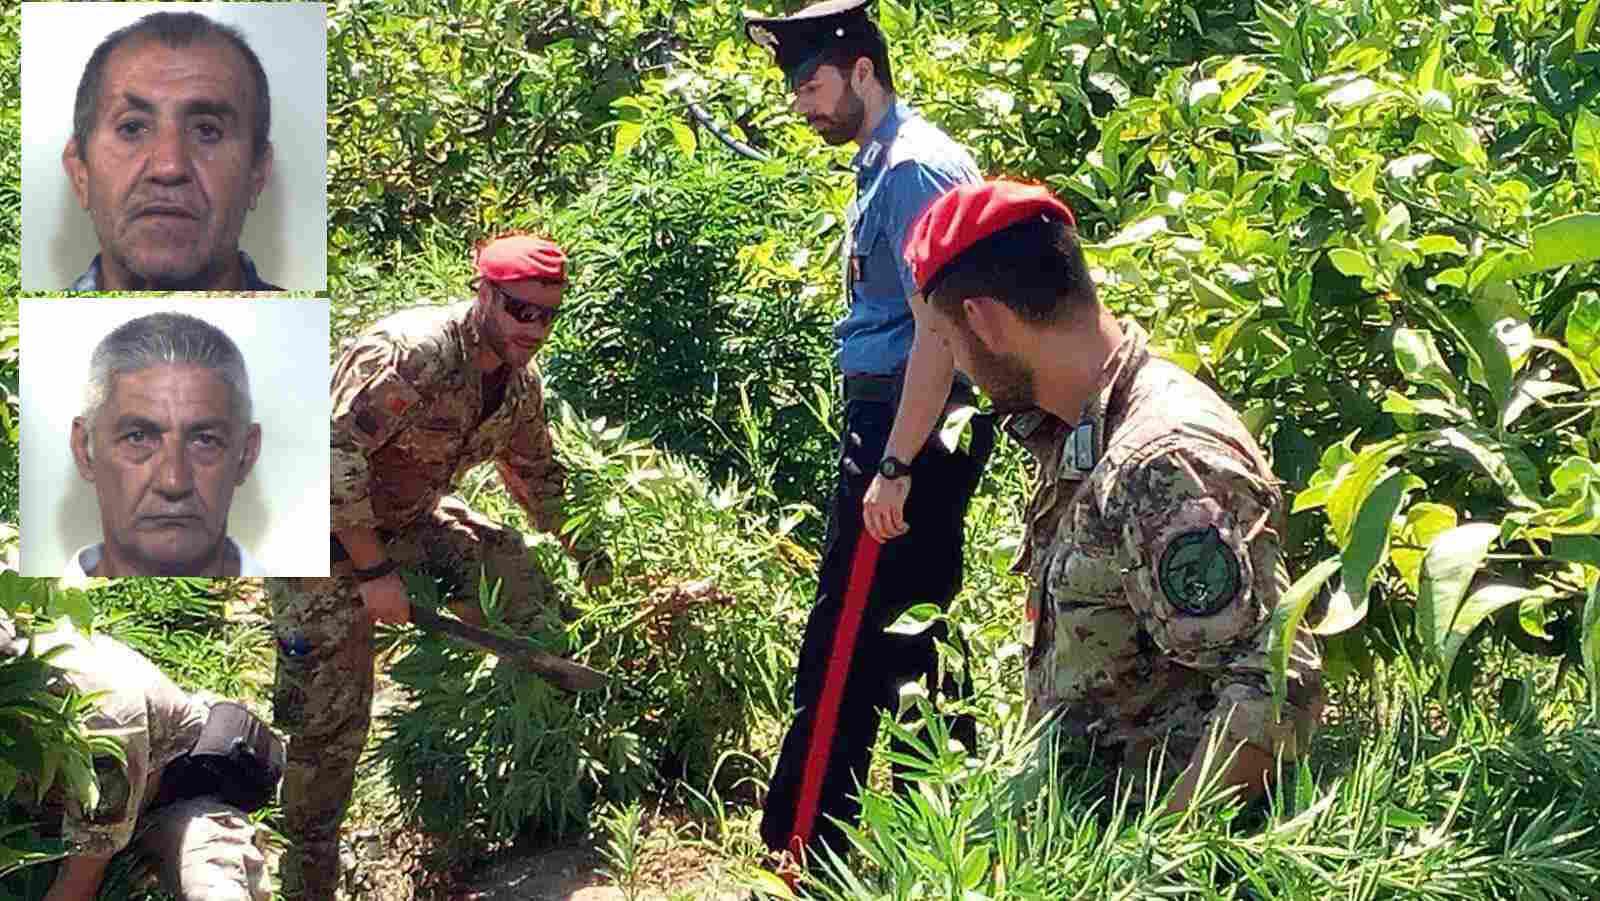 Una coltivazione di marijuana scoperta a Francofonte, due arresti